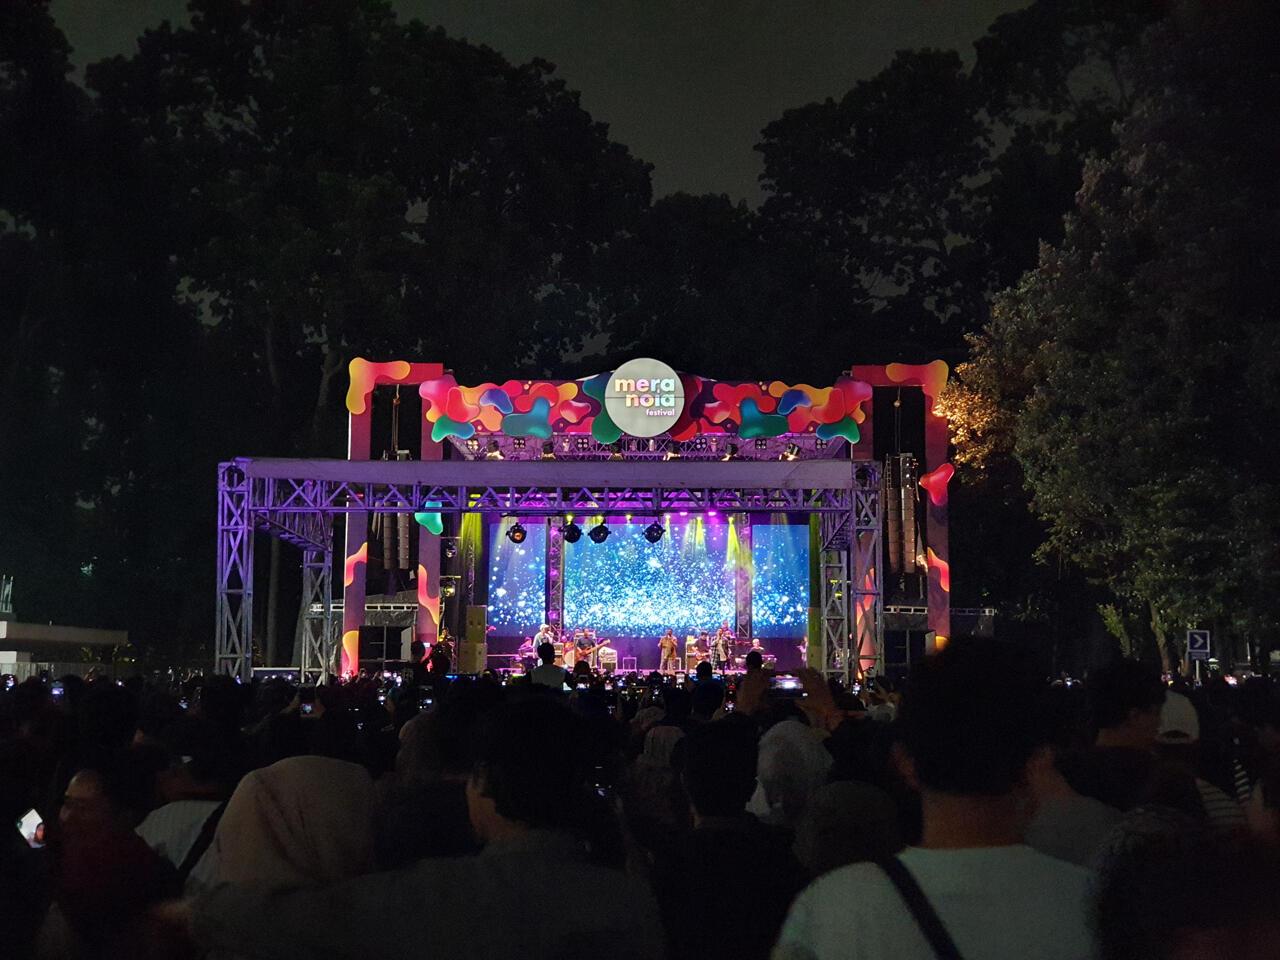 Awalnya Males Nonton Festival Musik Sendiri, Eh Malah Asyik Sendiri!